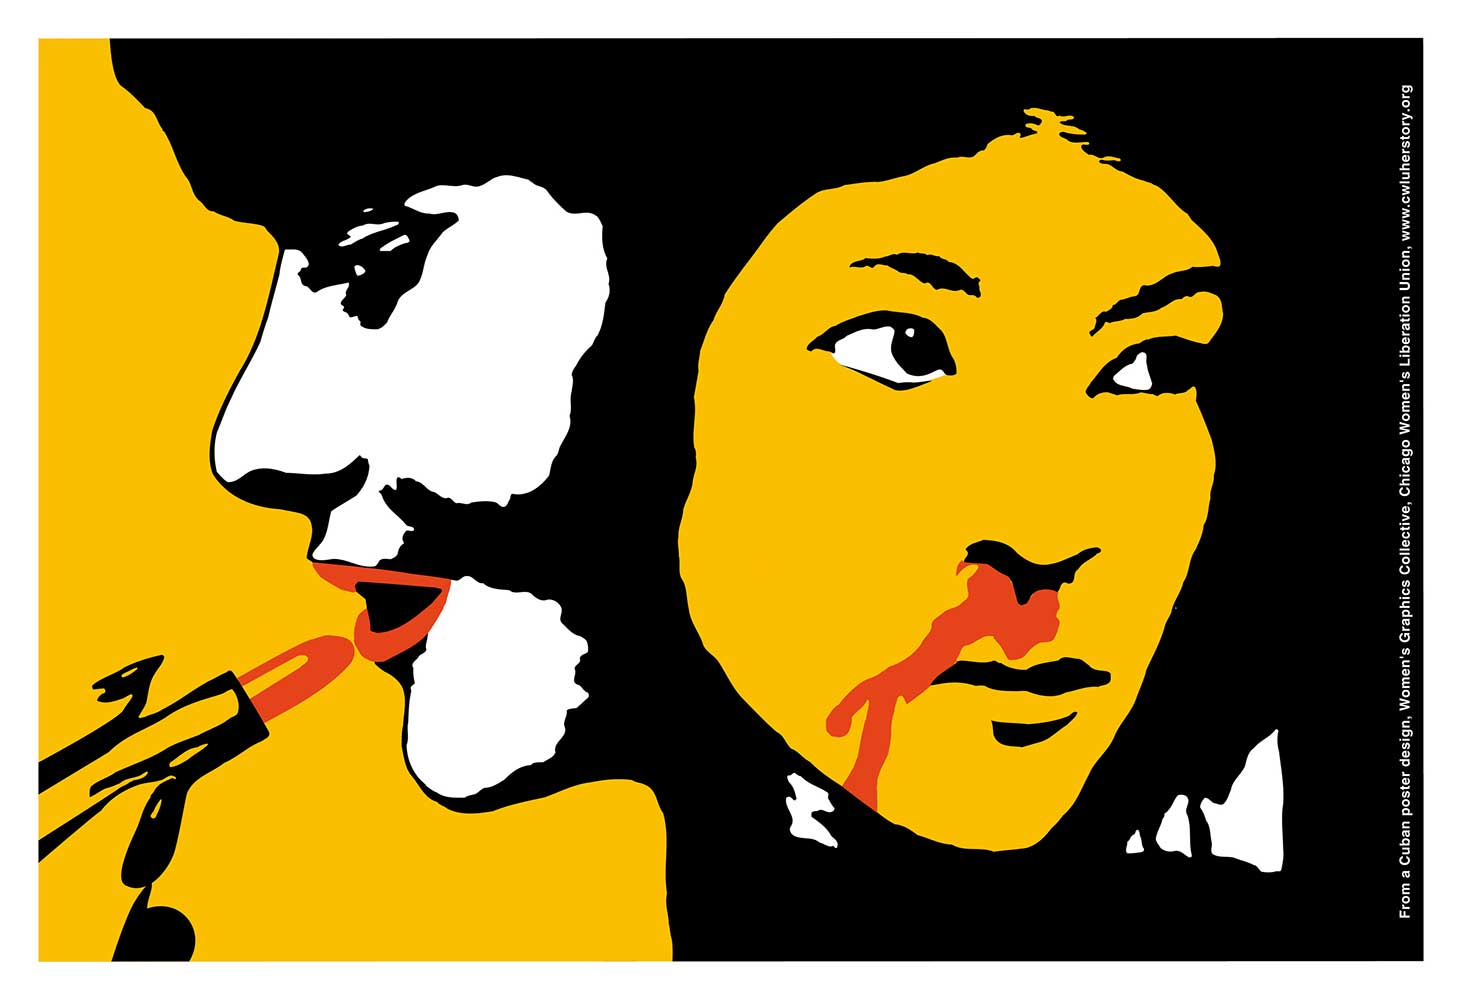 Lipstick and Violence